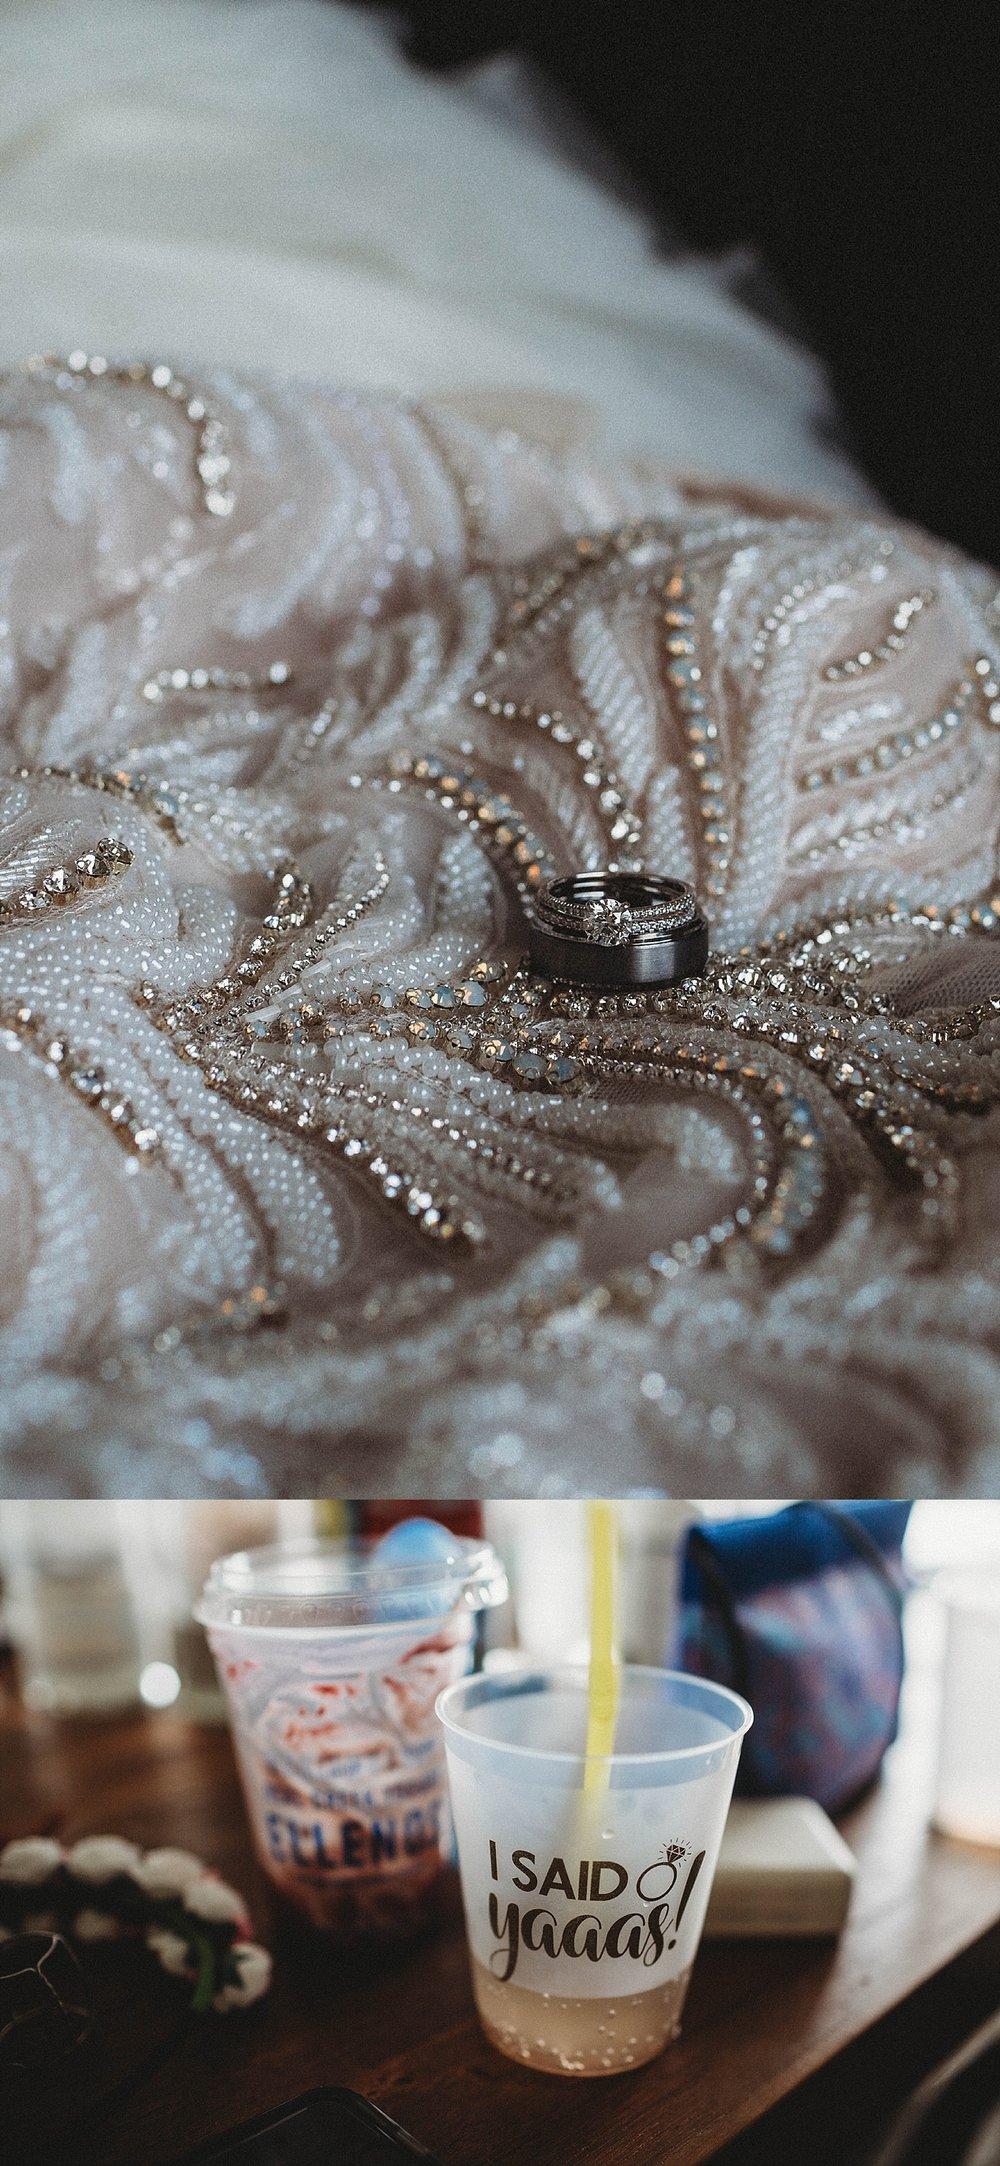 olson mansion wedding photography - jill and garrett - ashley vos photography - seattle area wedding photographer-14.jpg